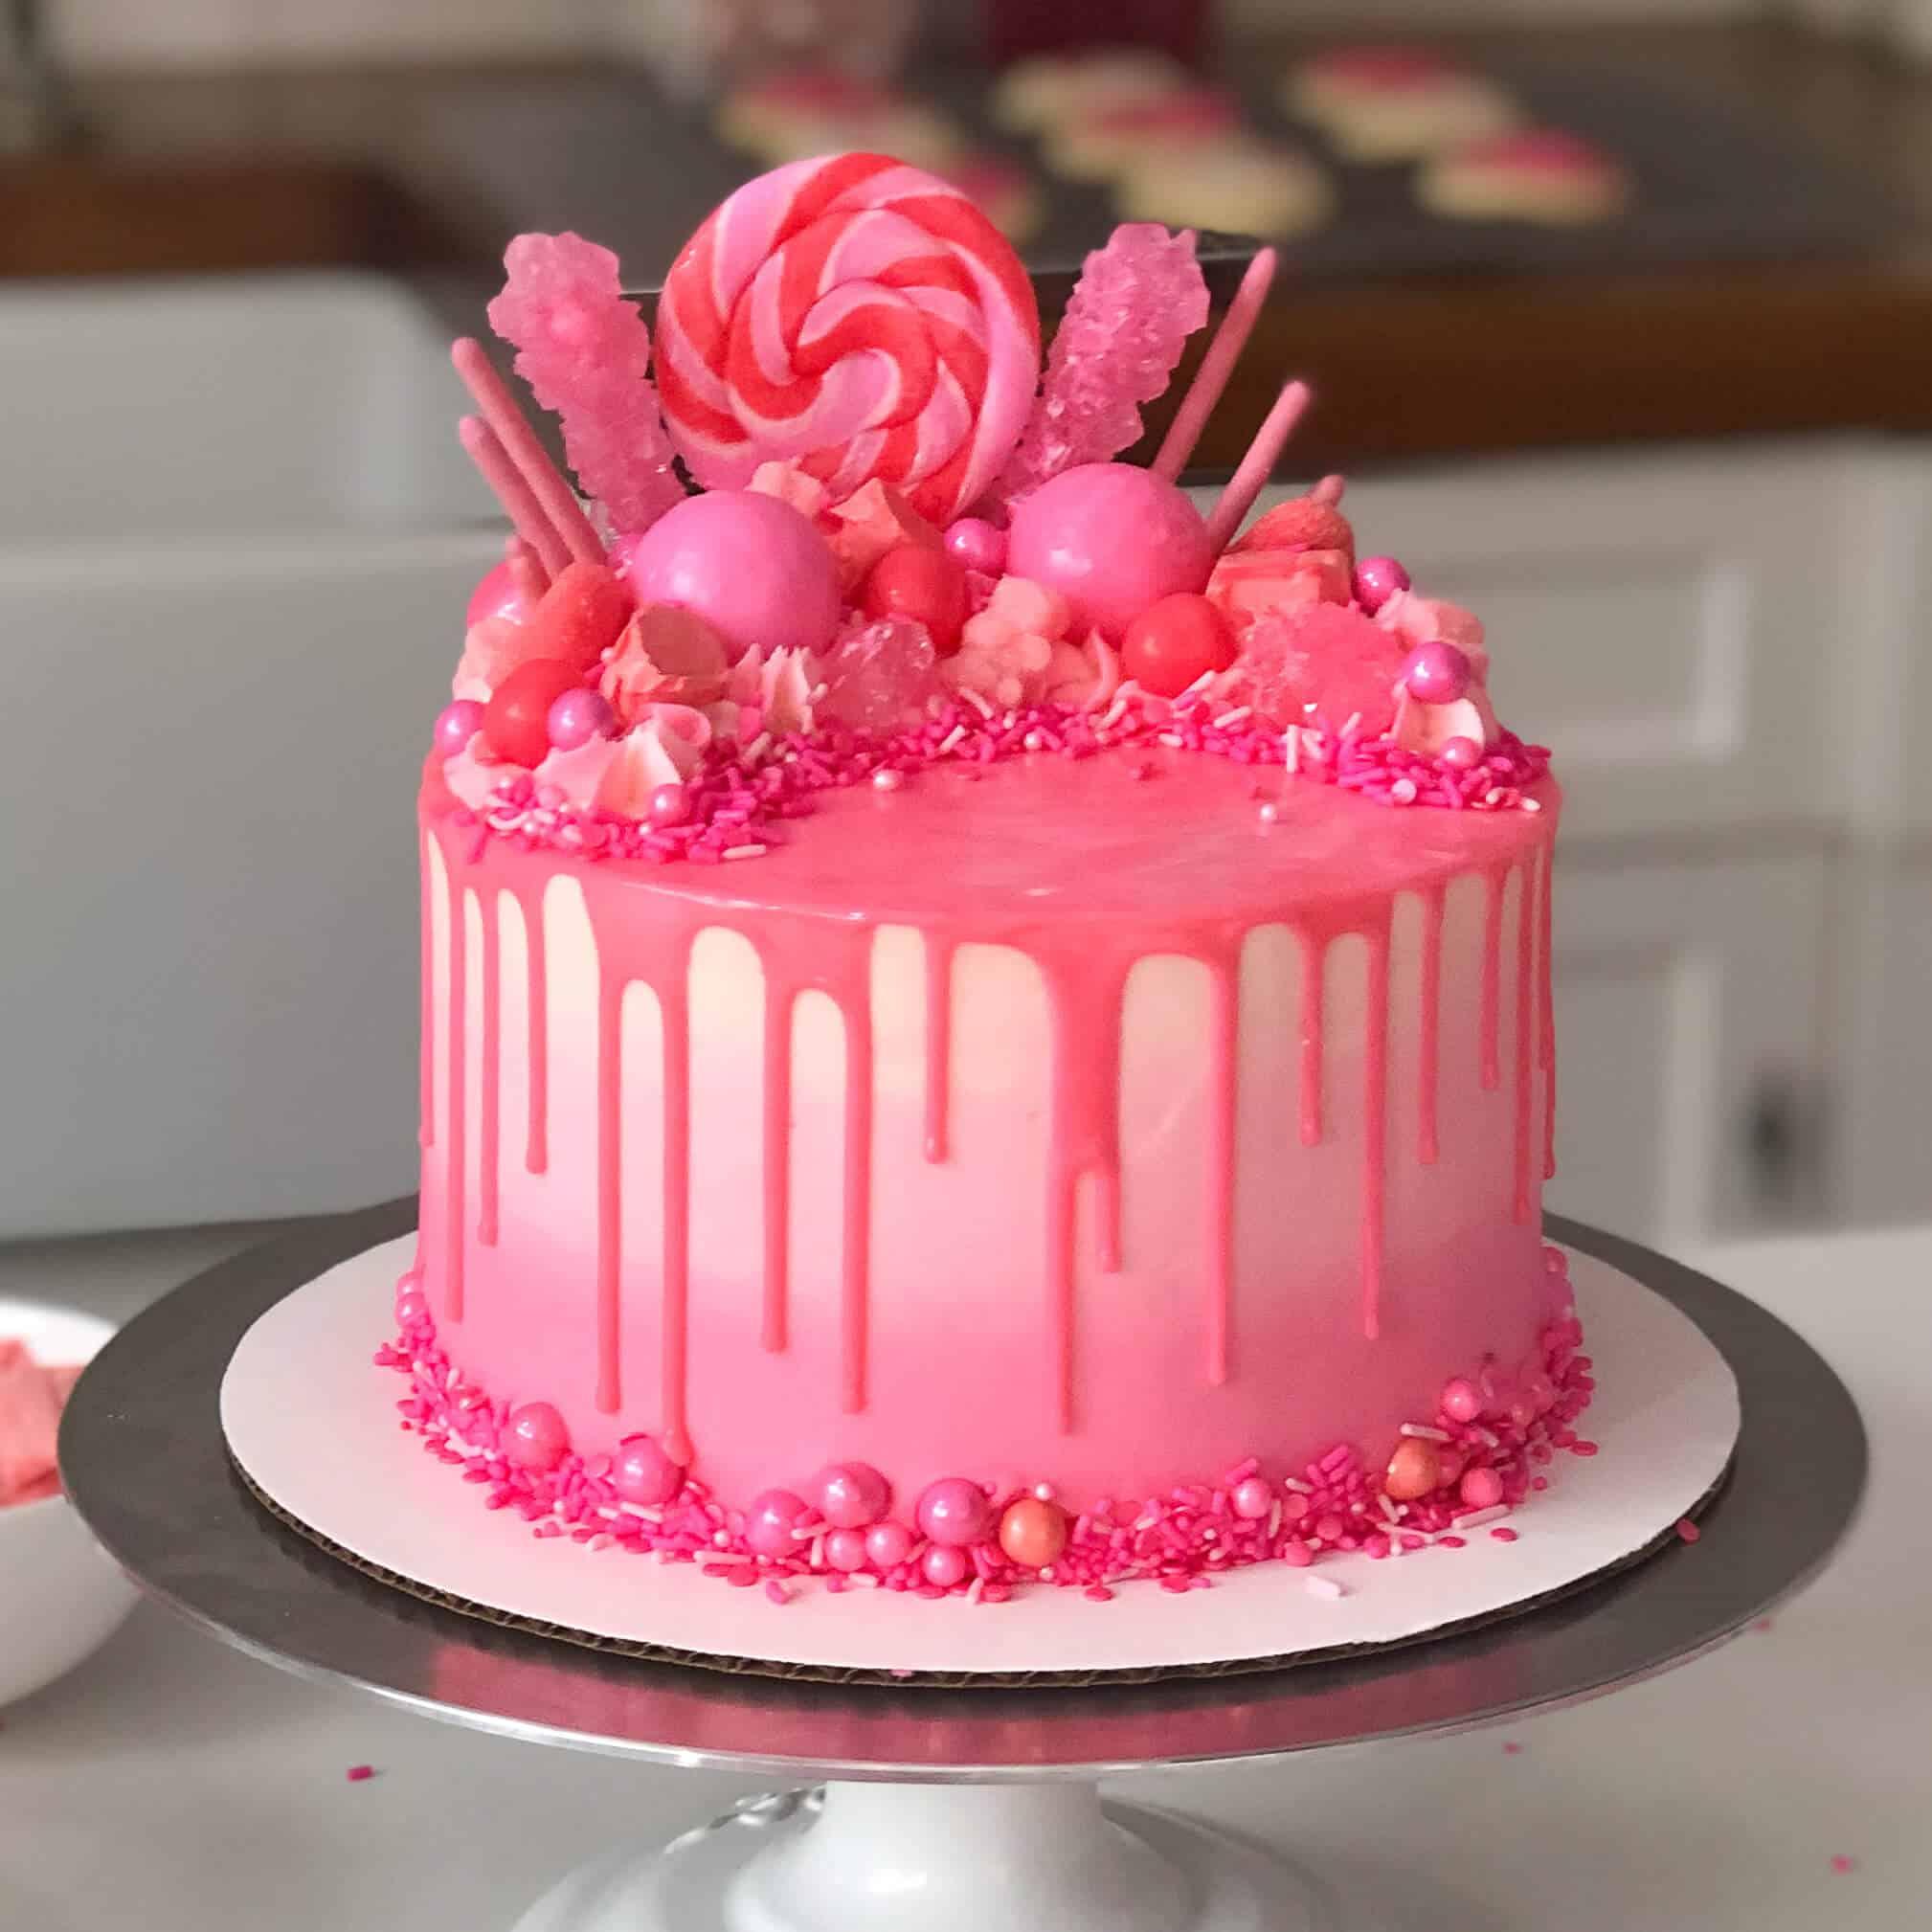 Drip Cake Recipe Tutorial Tips To Make The Perfect Drip Cake